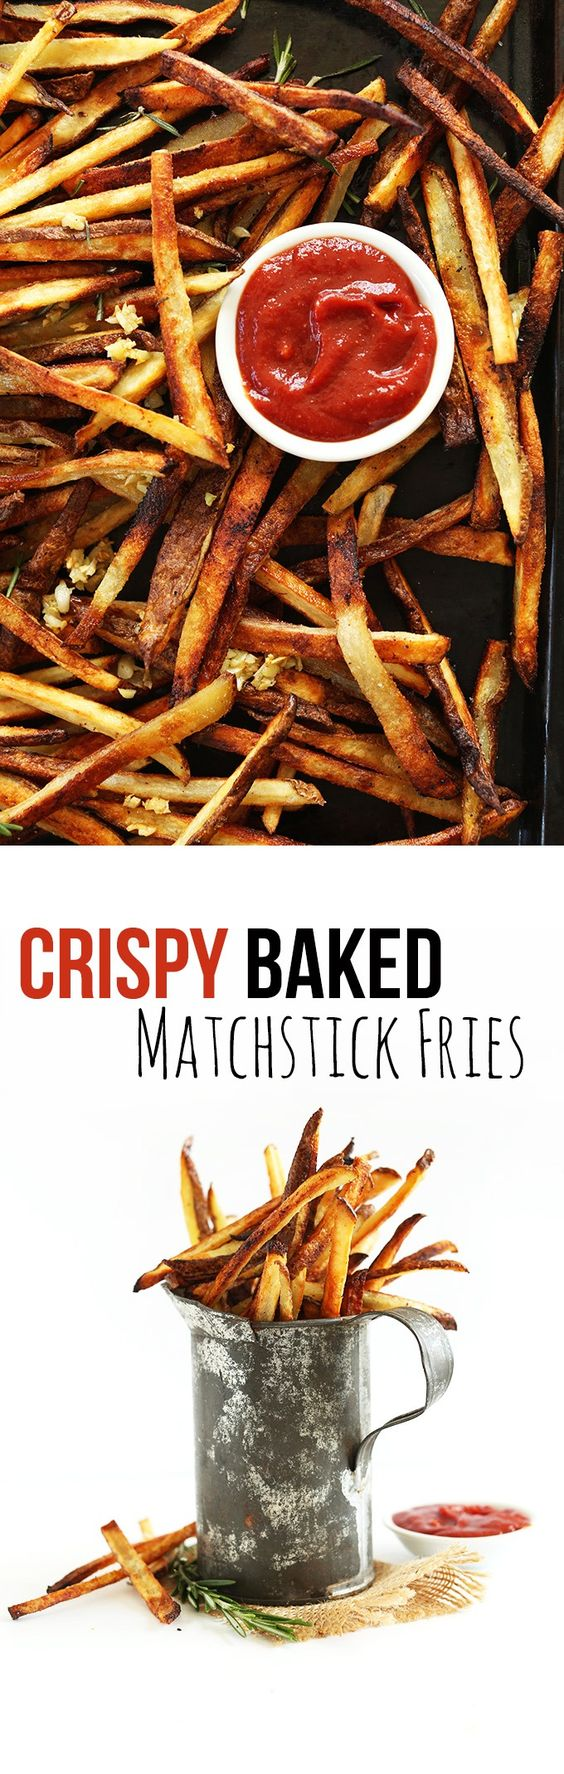 explore fries hmm yum fries and more garlic glutenfree vegans recipe